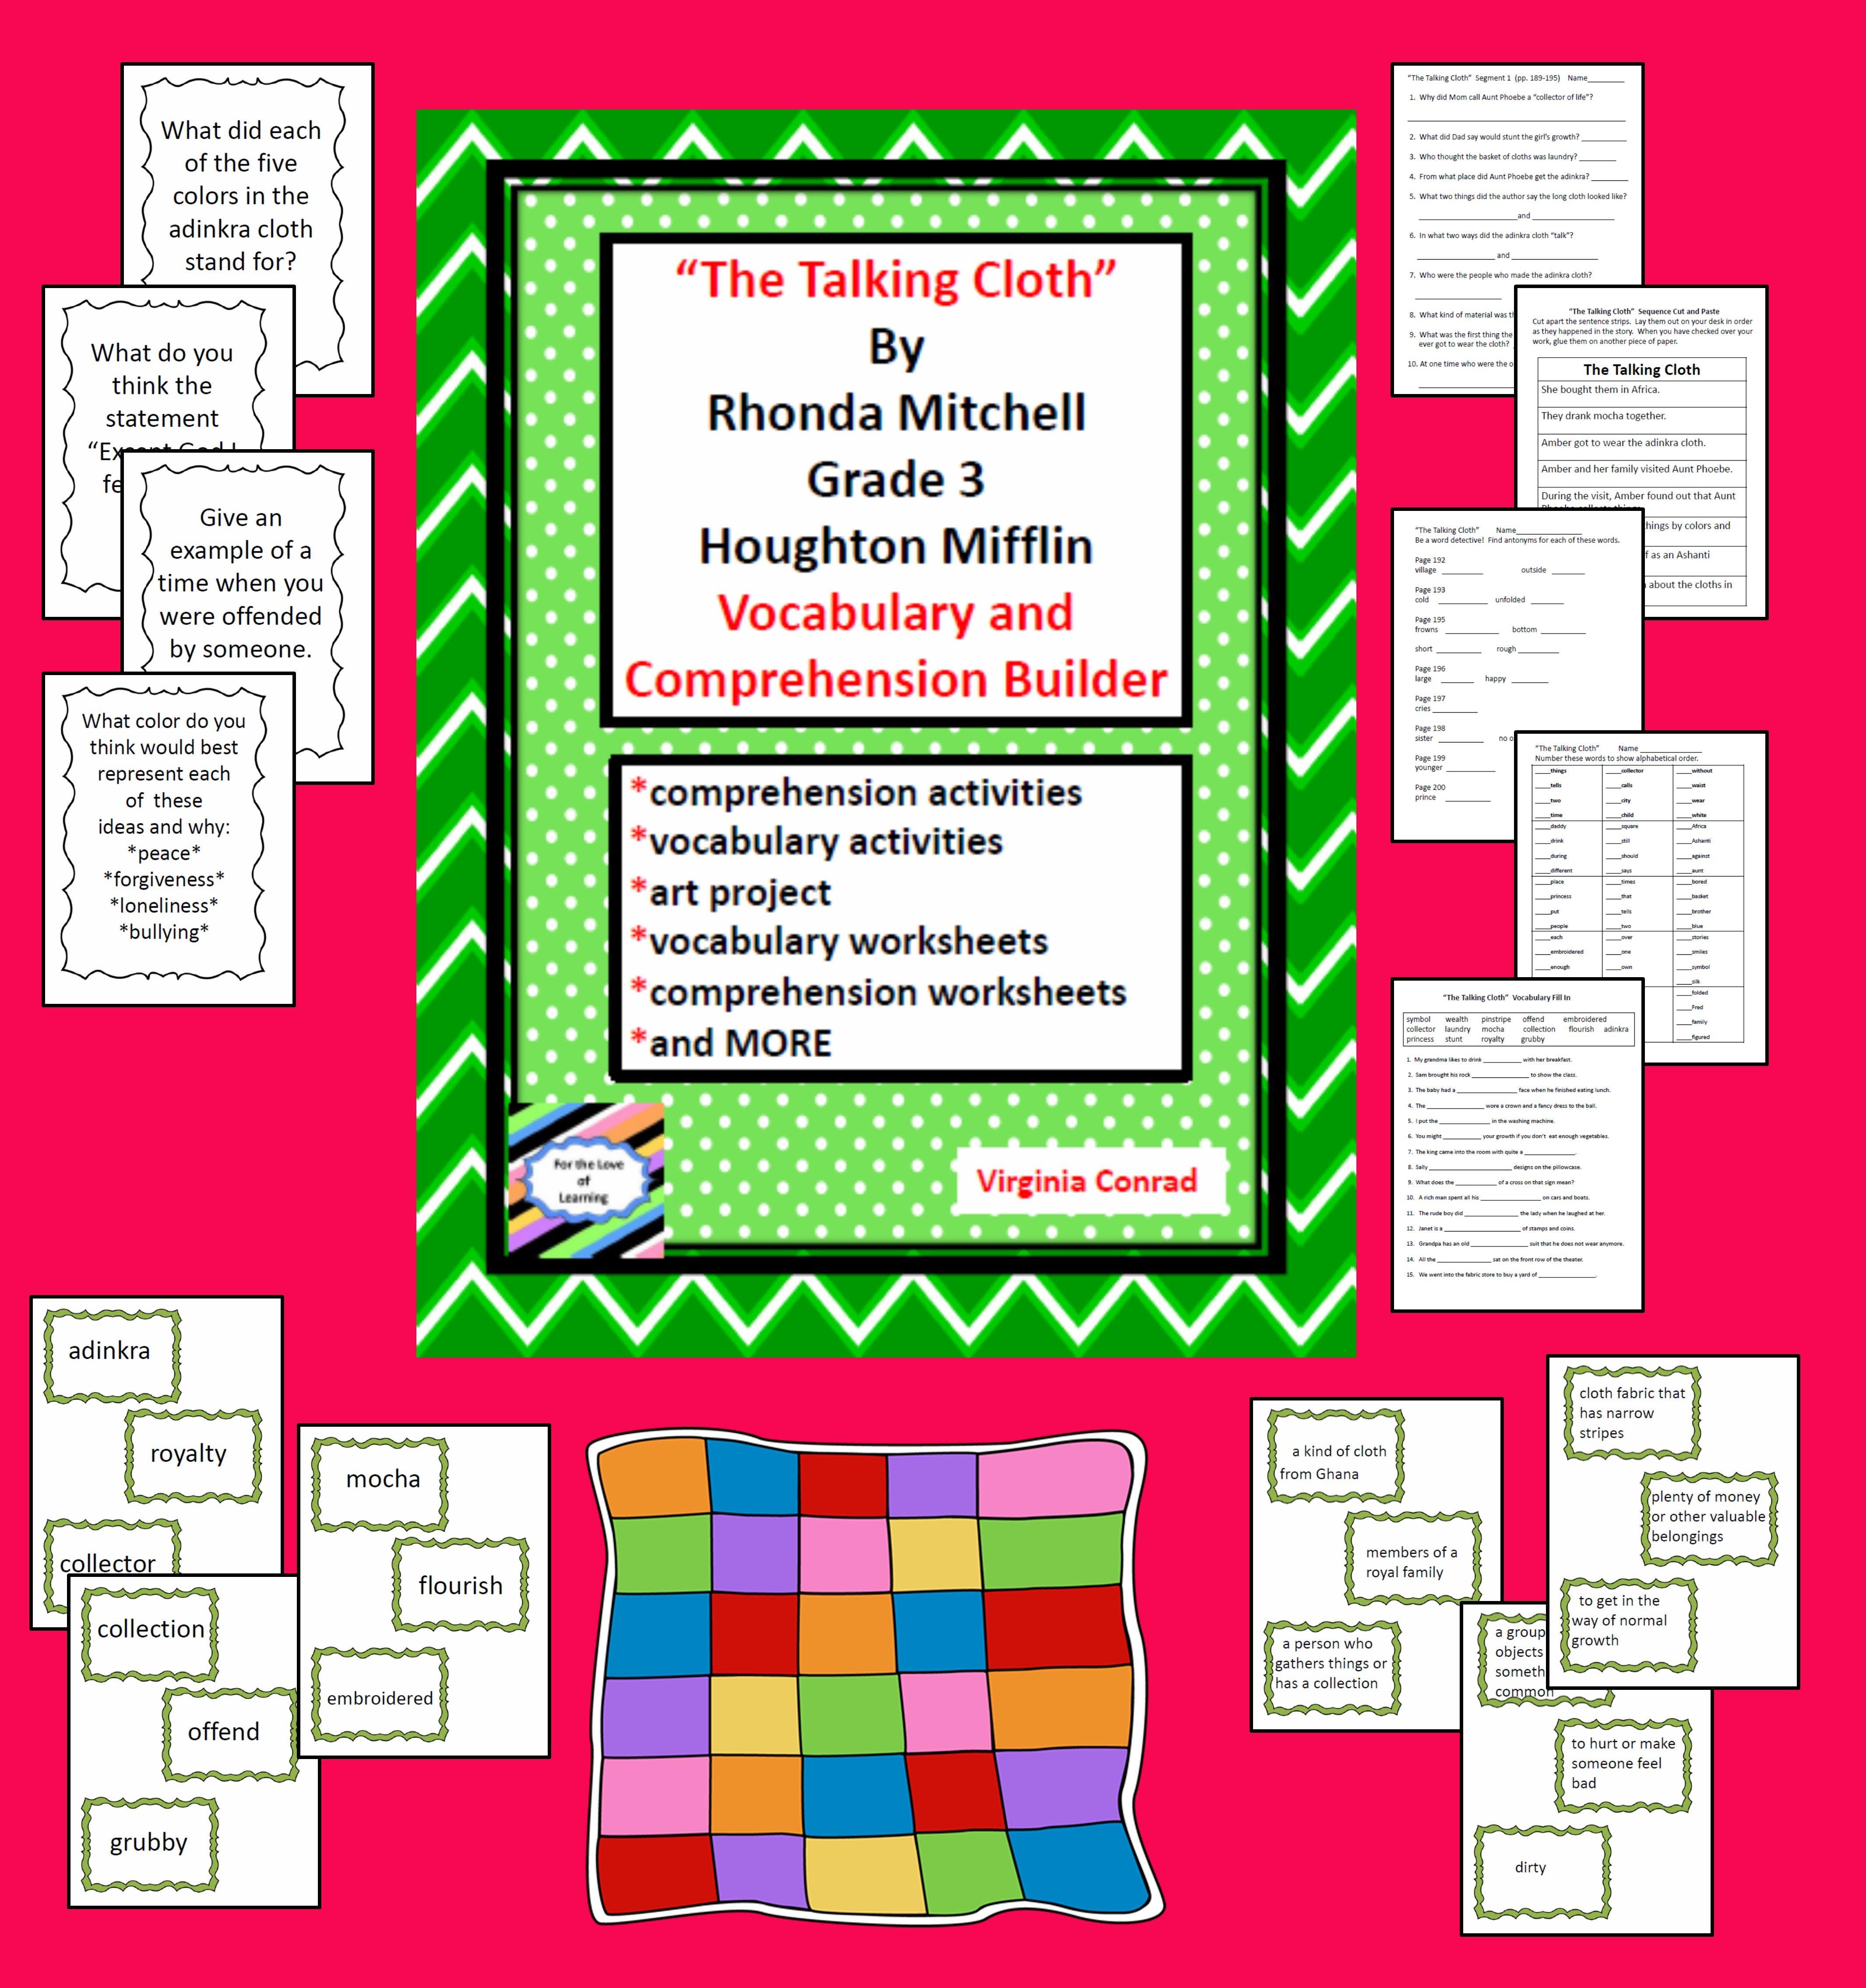 The Talking Cloth Houghton Mifflin Grade 3